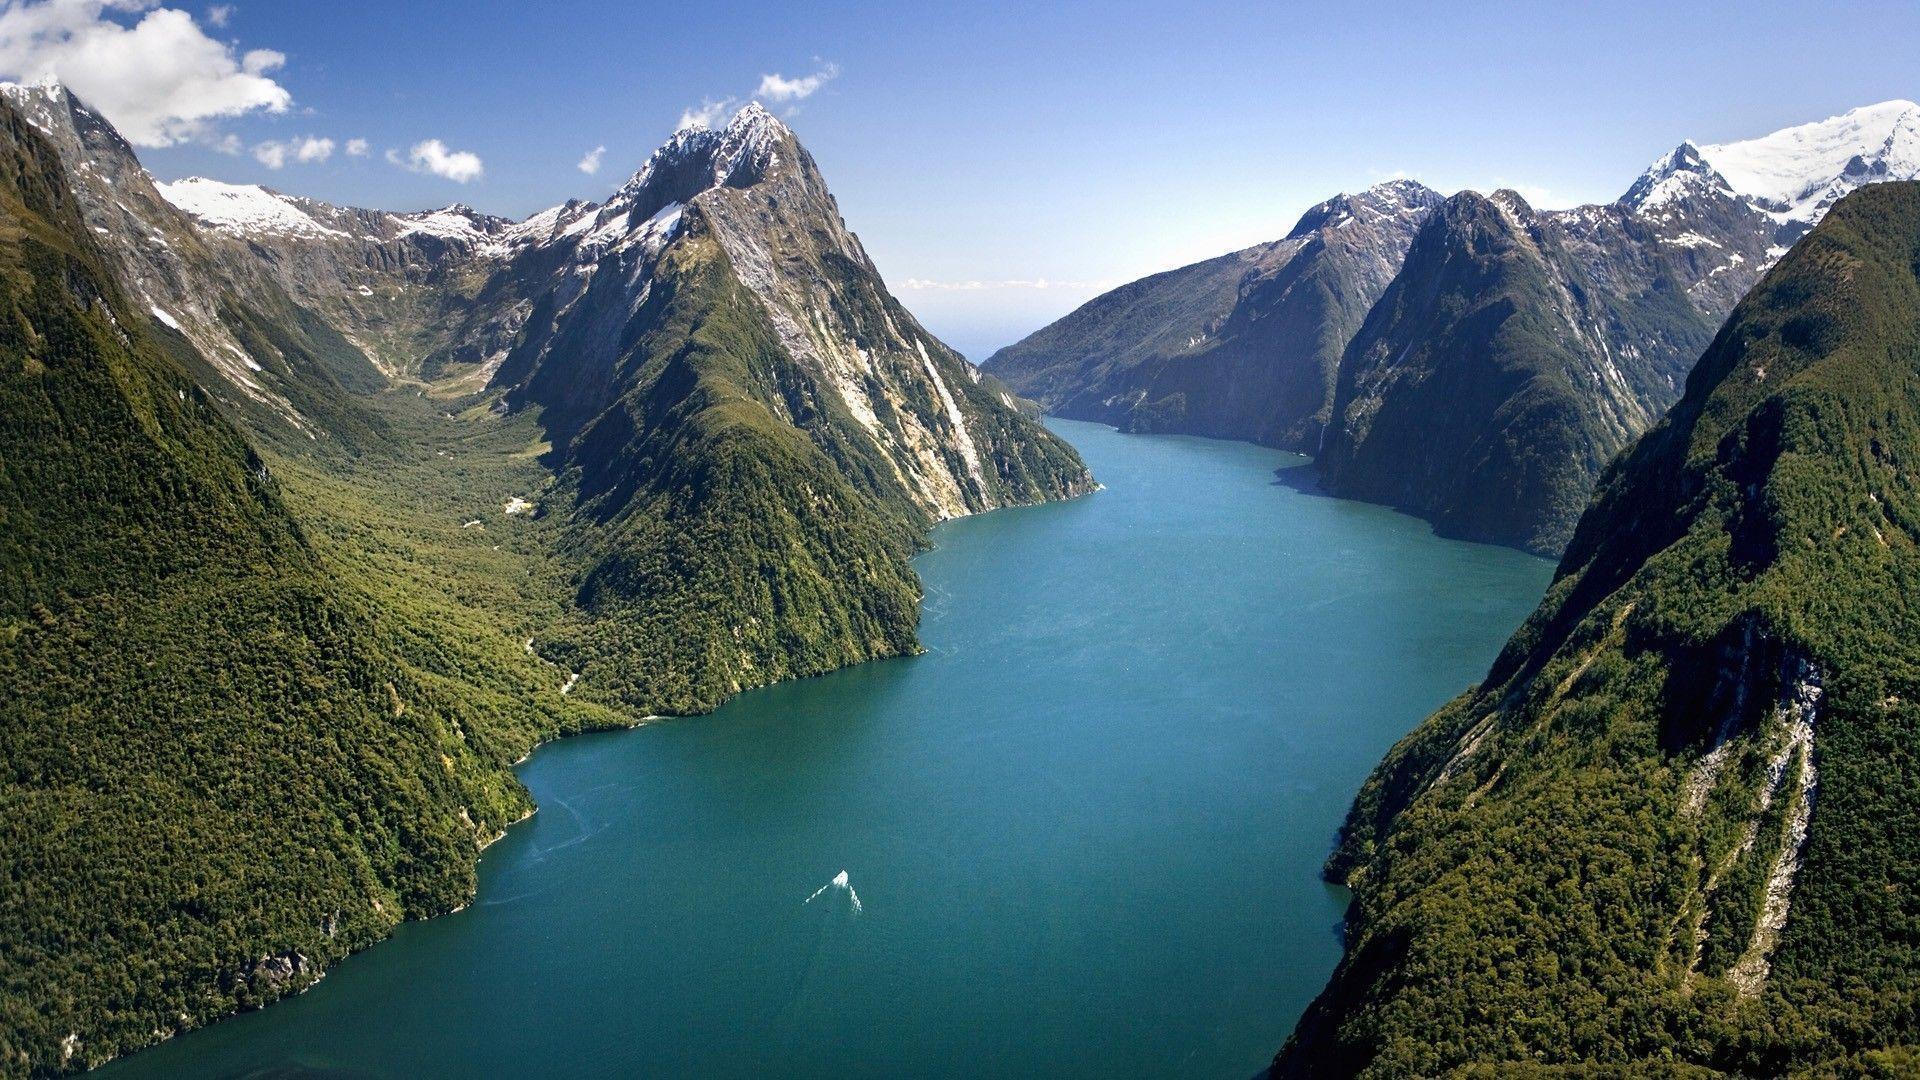 New Zealand Desktop Wallpapers   Data-src /full/121518 - New Zealand Wallpapers Hd - HD Wallpaper